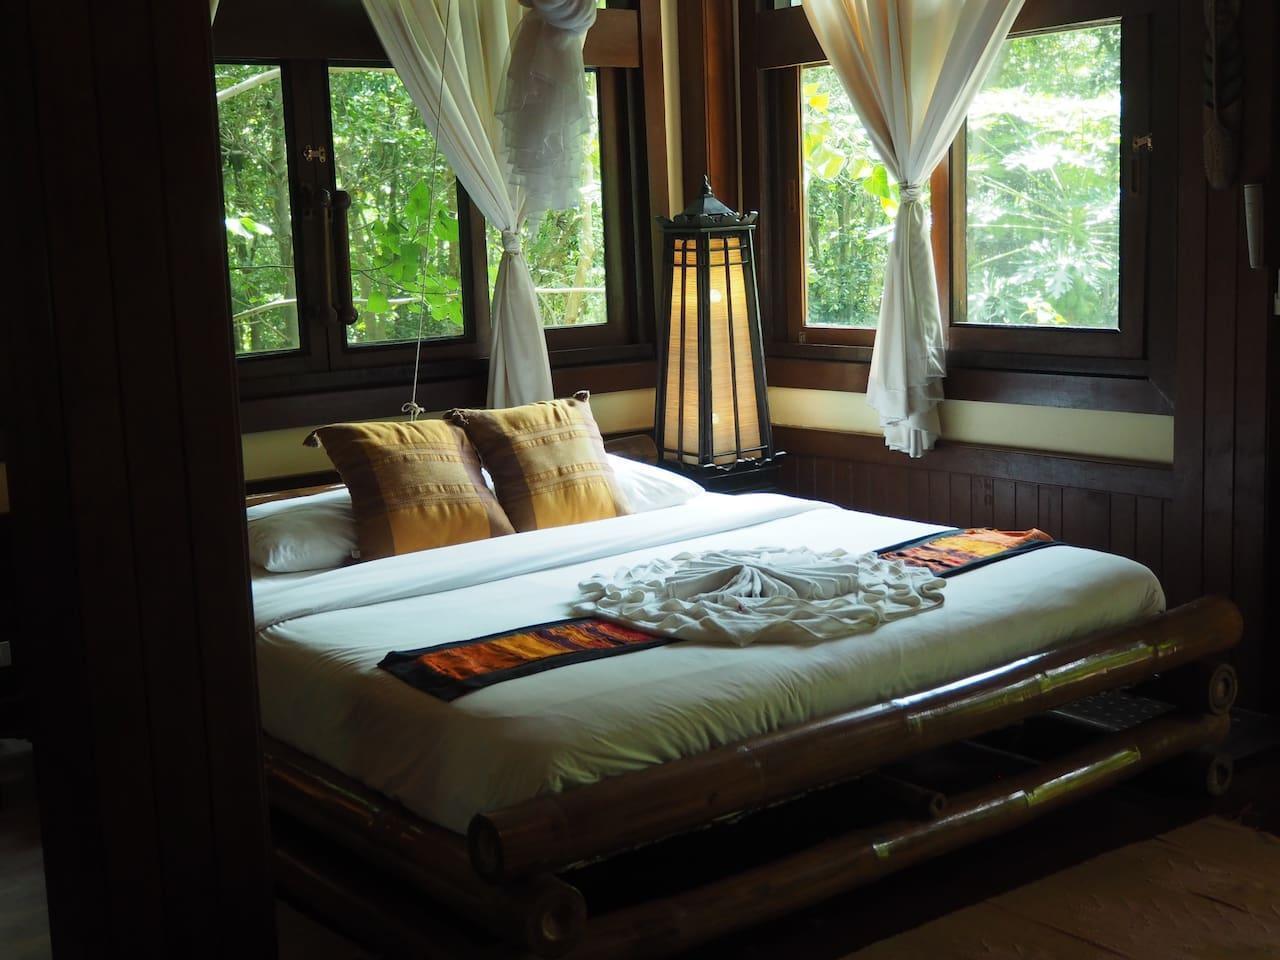 Luxurious Contemporary Deluxe Room - Sea View บังกะโล 1 ห้องนอน 1 ห้องน้ำส่วนตัว ขนาด 40 ตร.ม. – อ่าวโละดาลัม